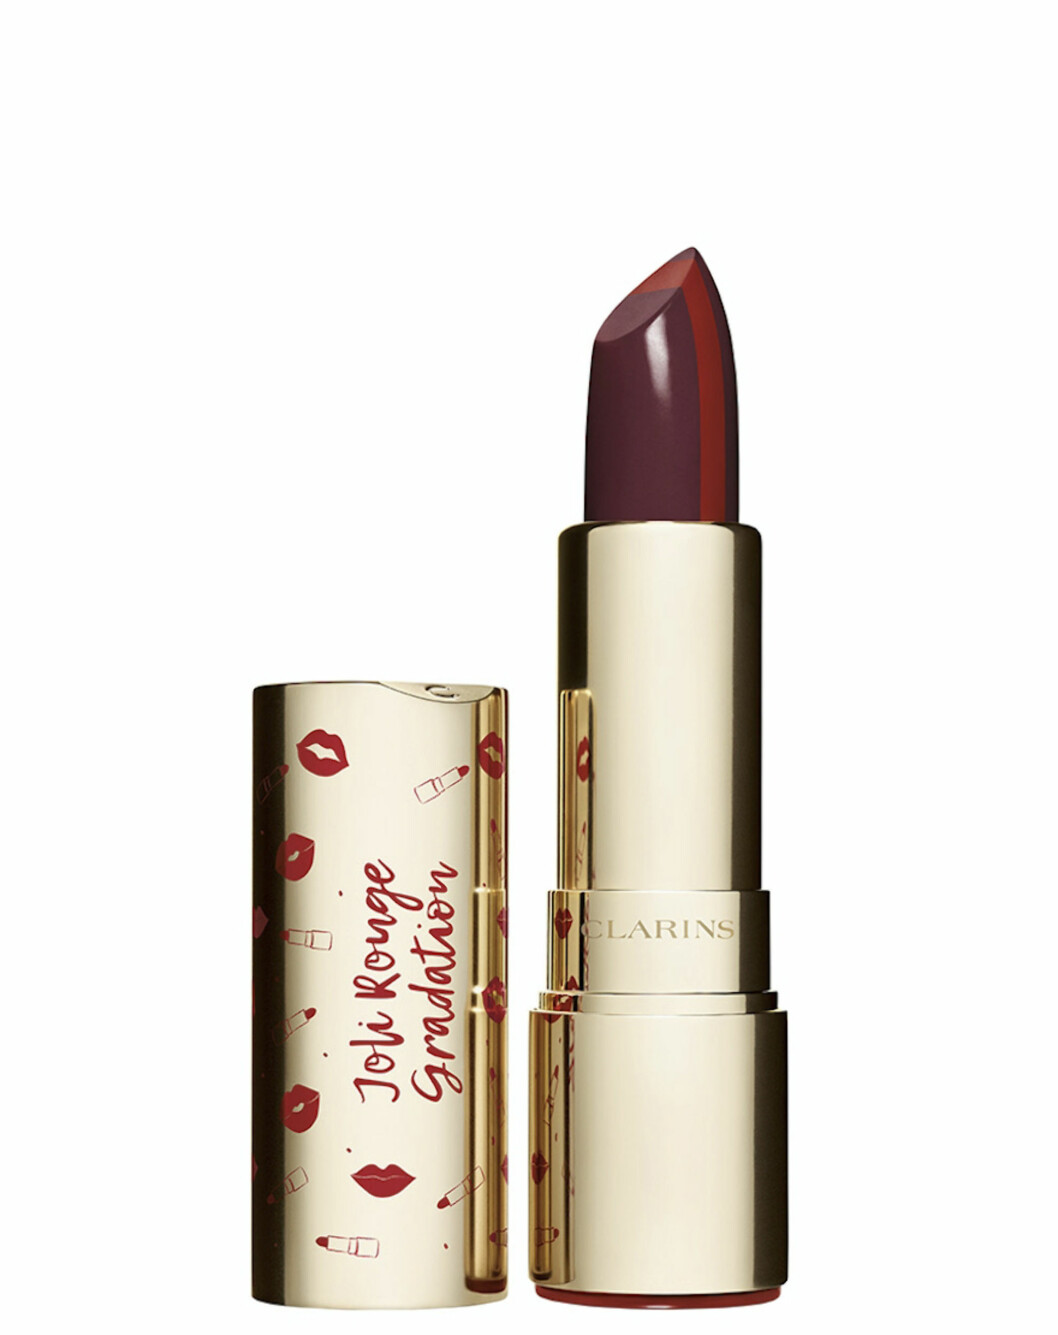 Burgunder og rød leppestift (kr 230, Clarins, Joli Rouge Gradation).